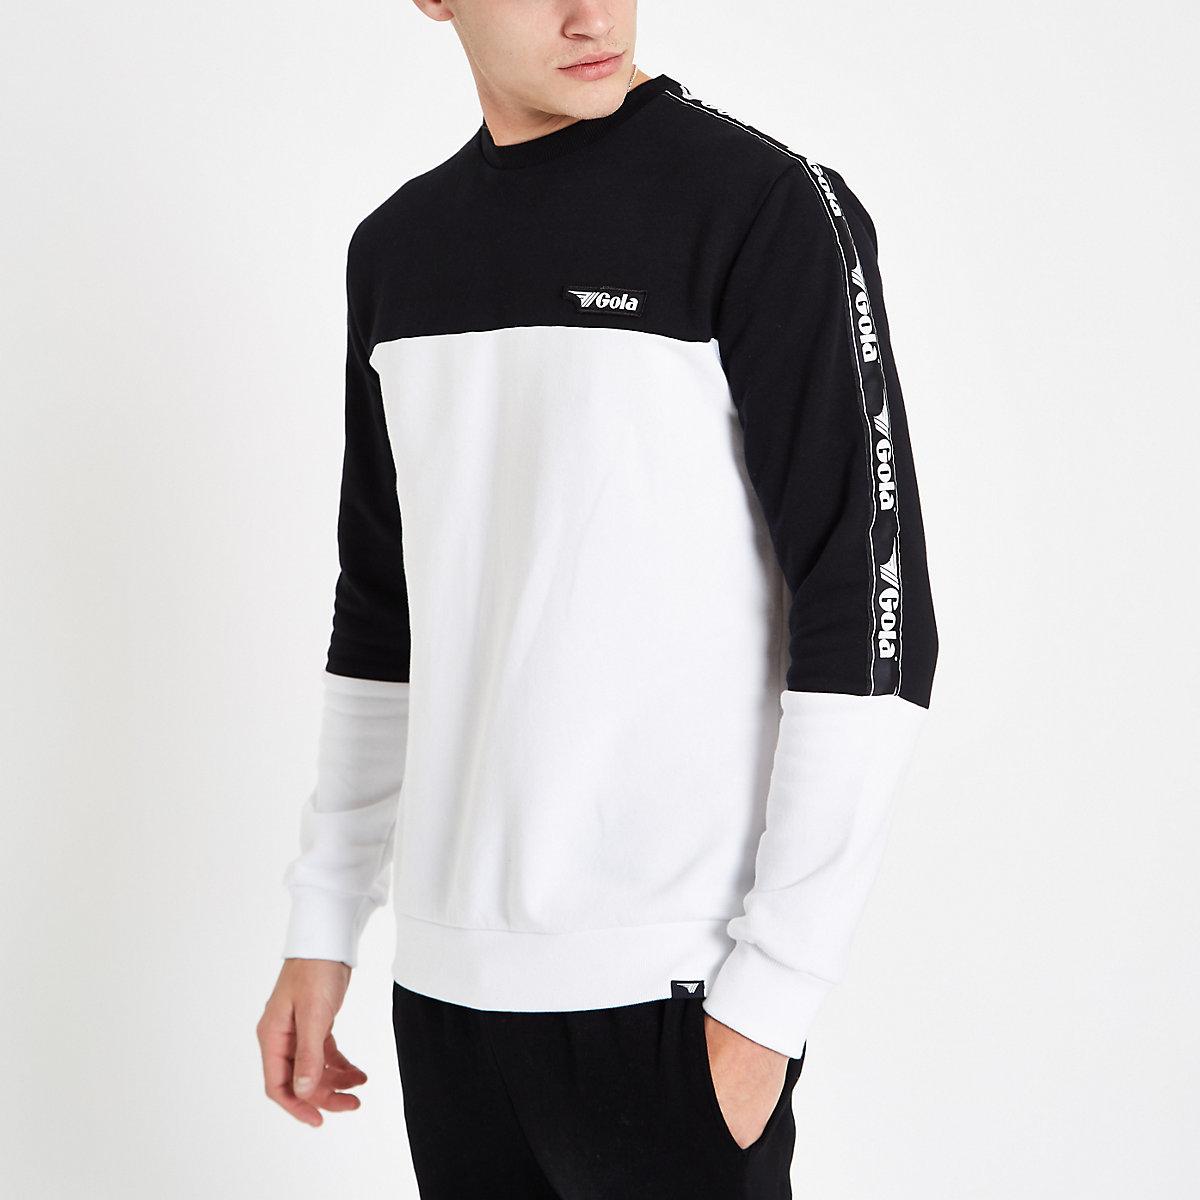 Gola white colour block sweatshirt